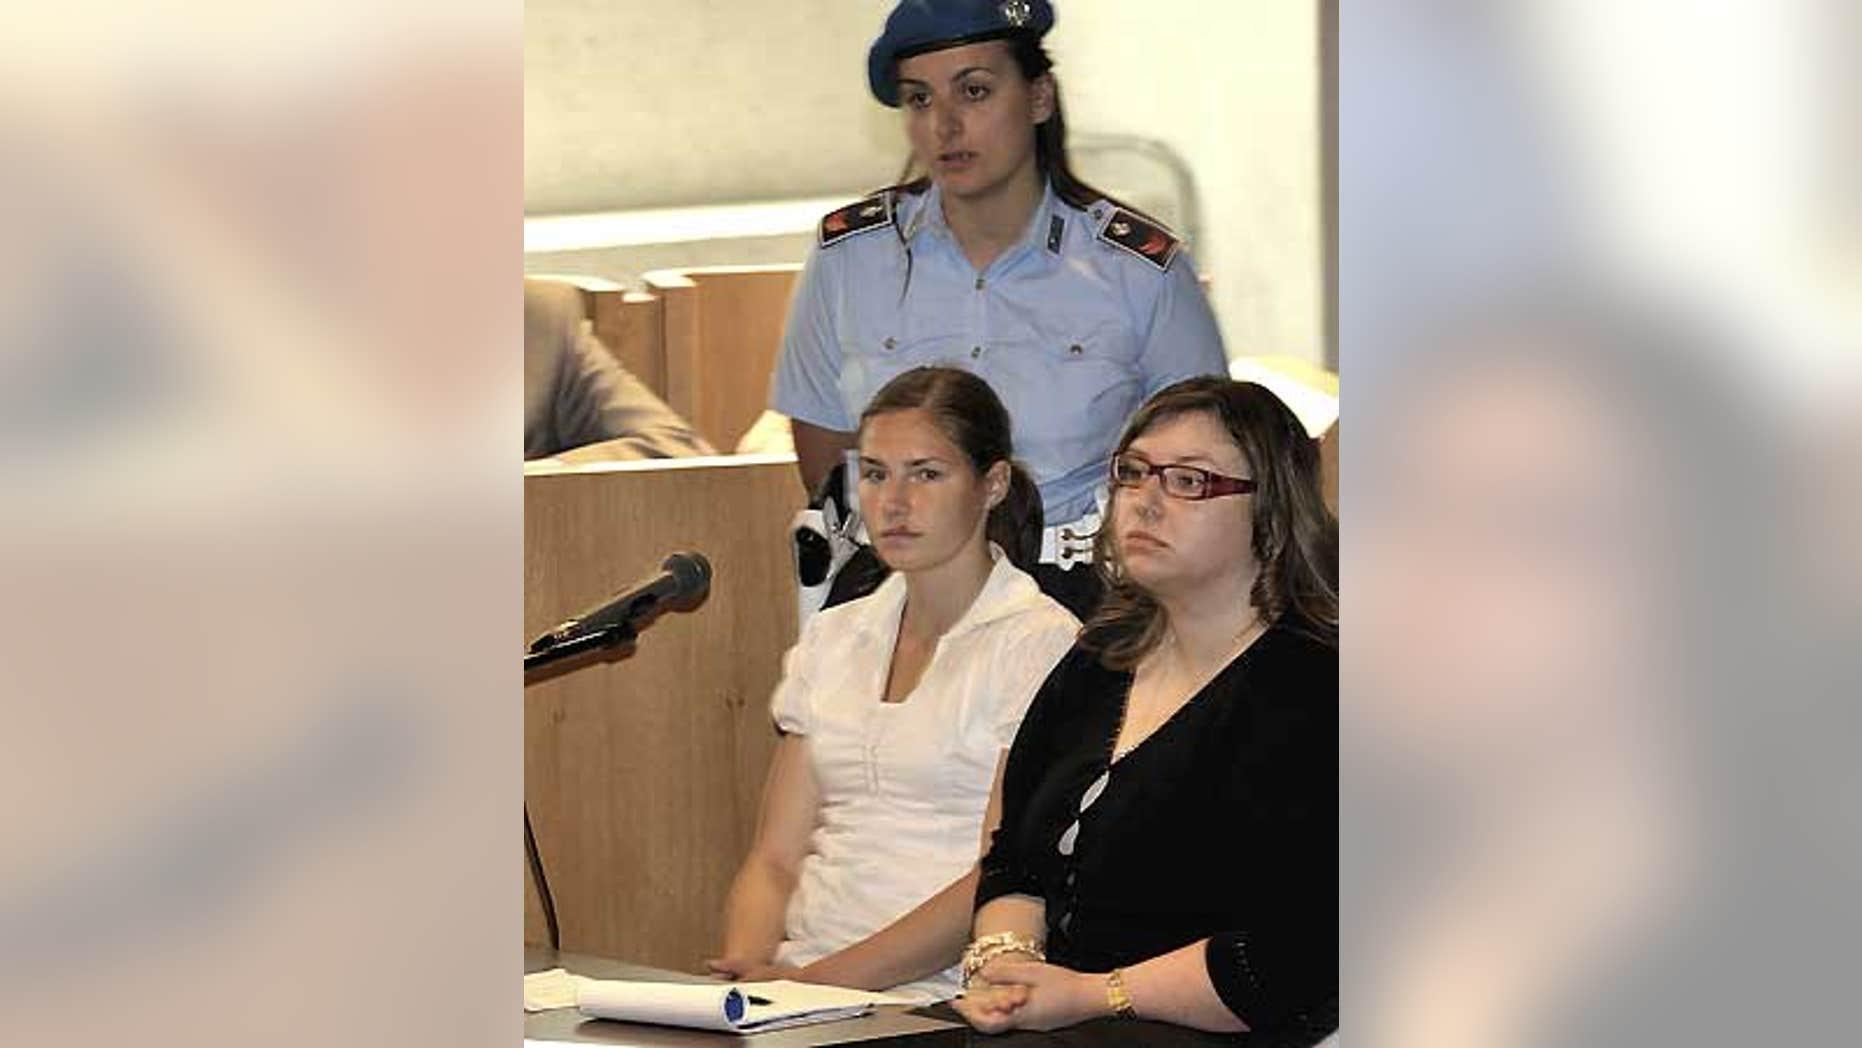 June 12: Amanda Knox testifies during a hearing in the Meredith Kercher murder trial, in Perugia, Italy.